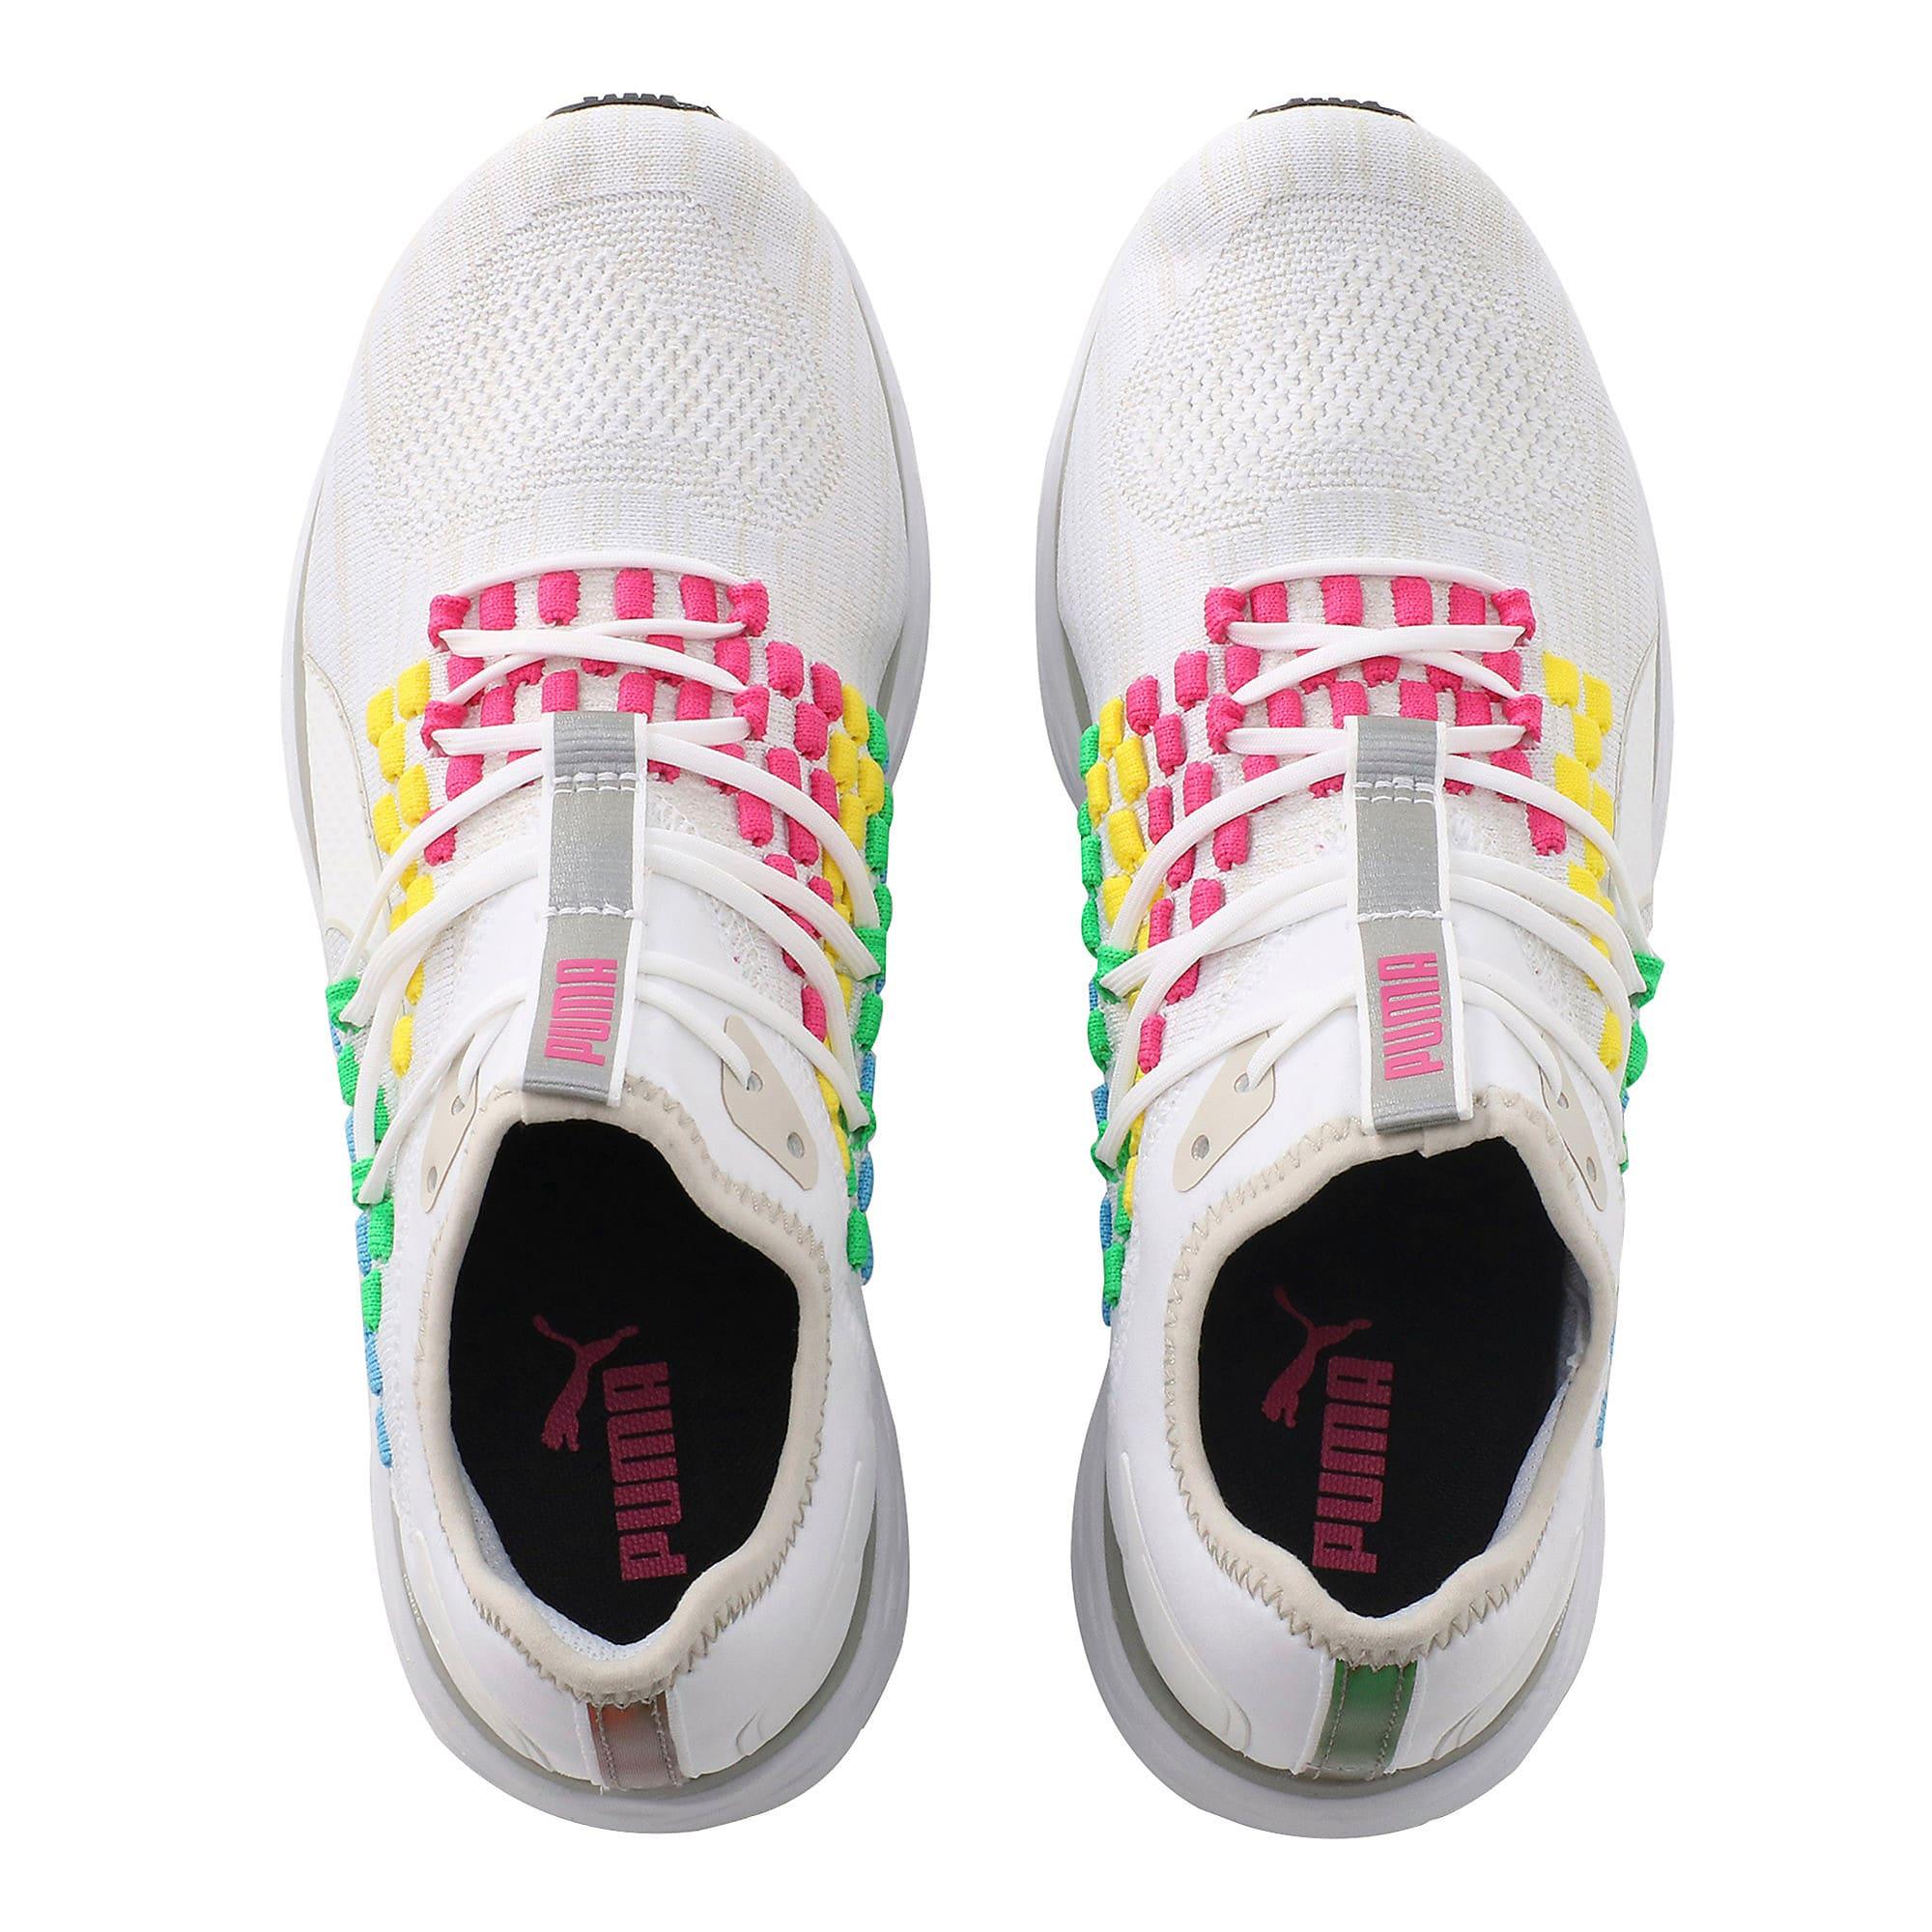 Thumbnail 6 of Speed 600 FUSEFIT Women's Running Sneakers, Puma White, medium-IND